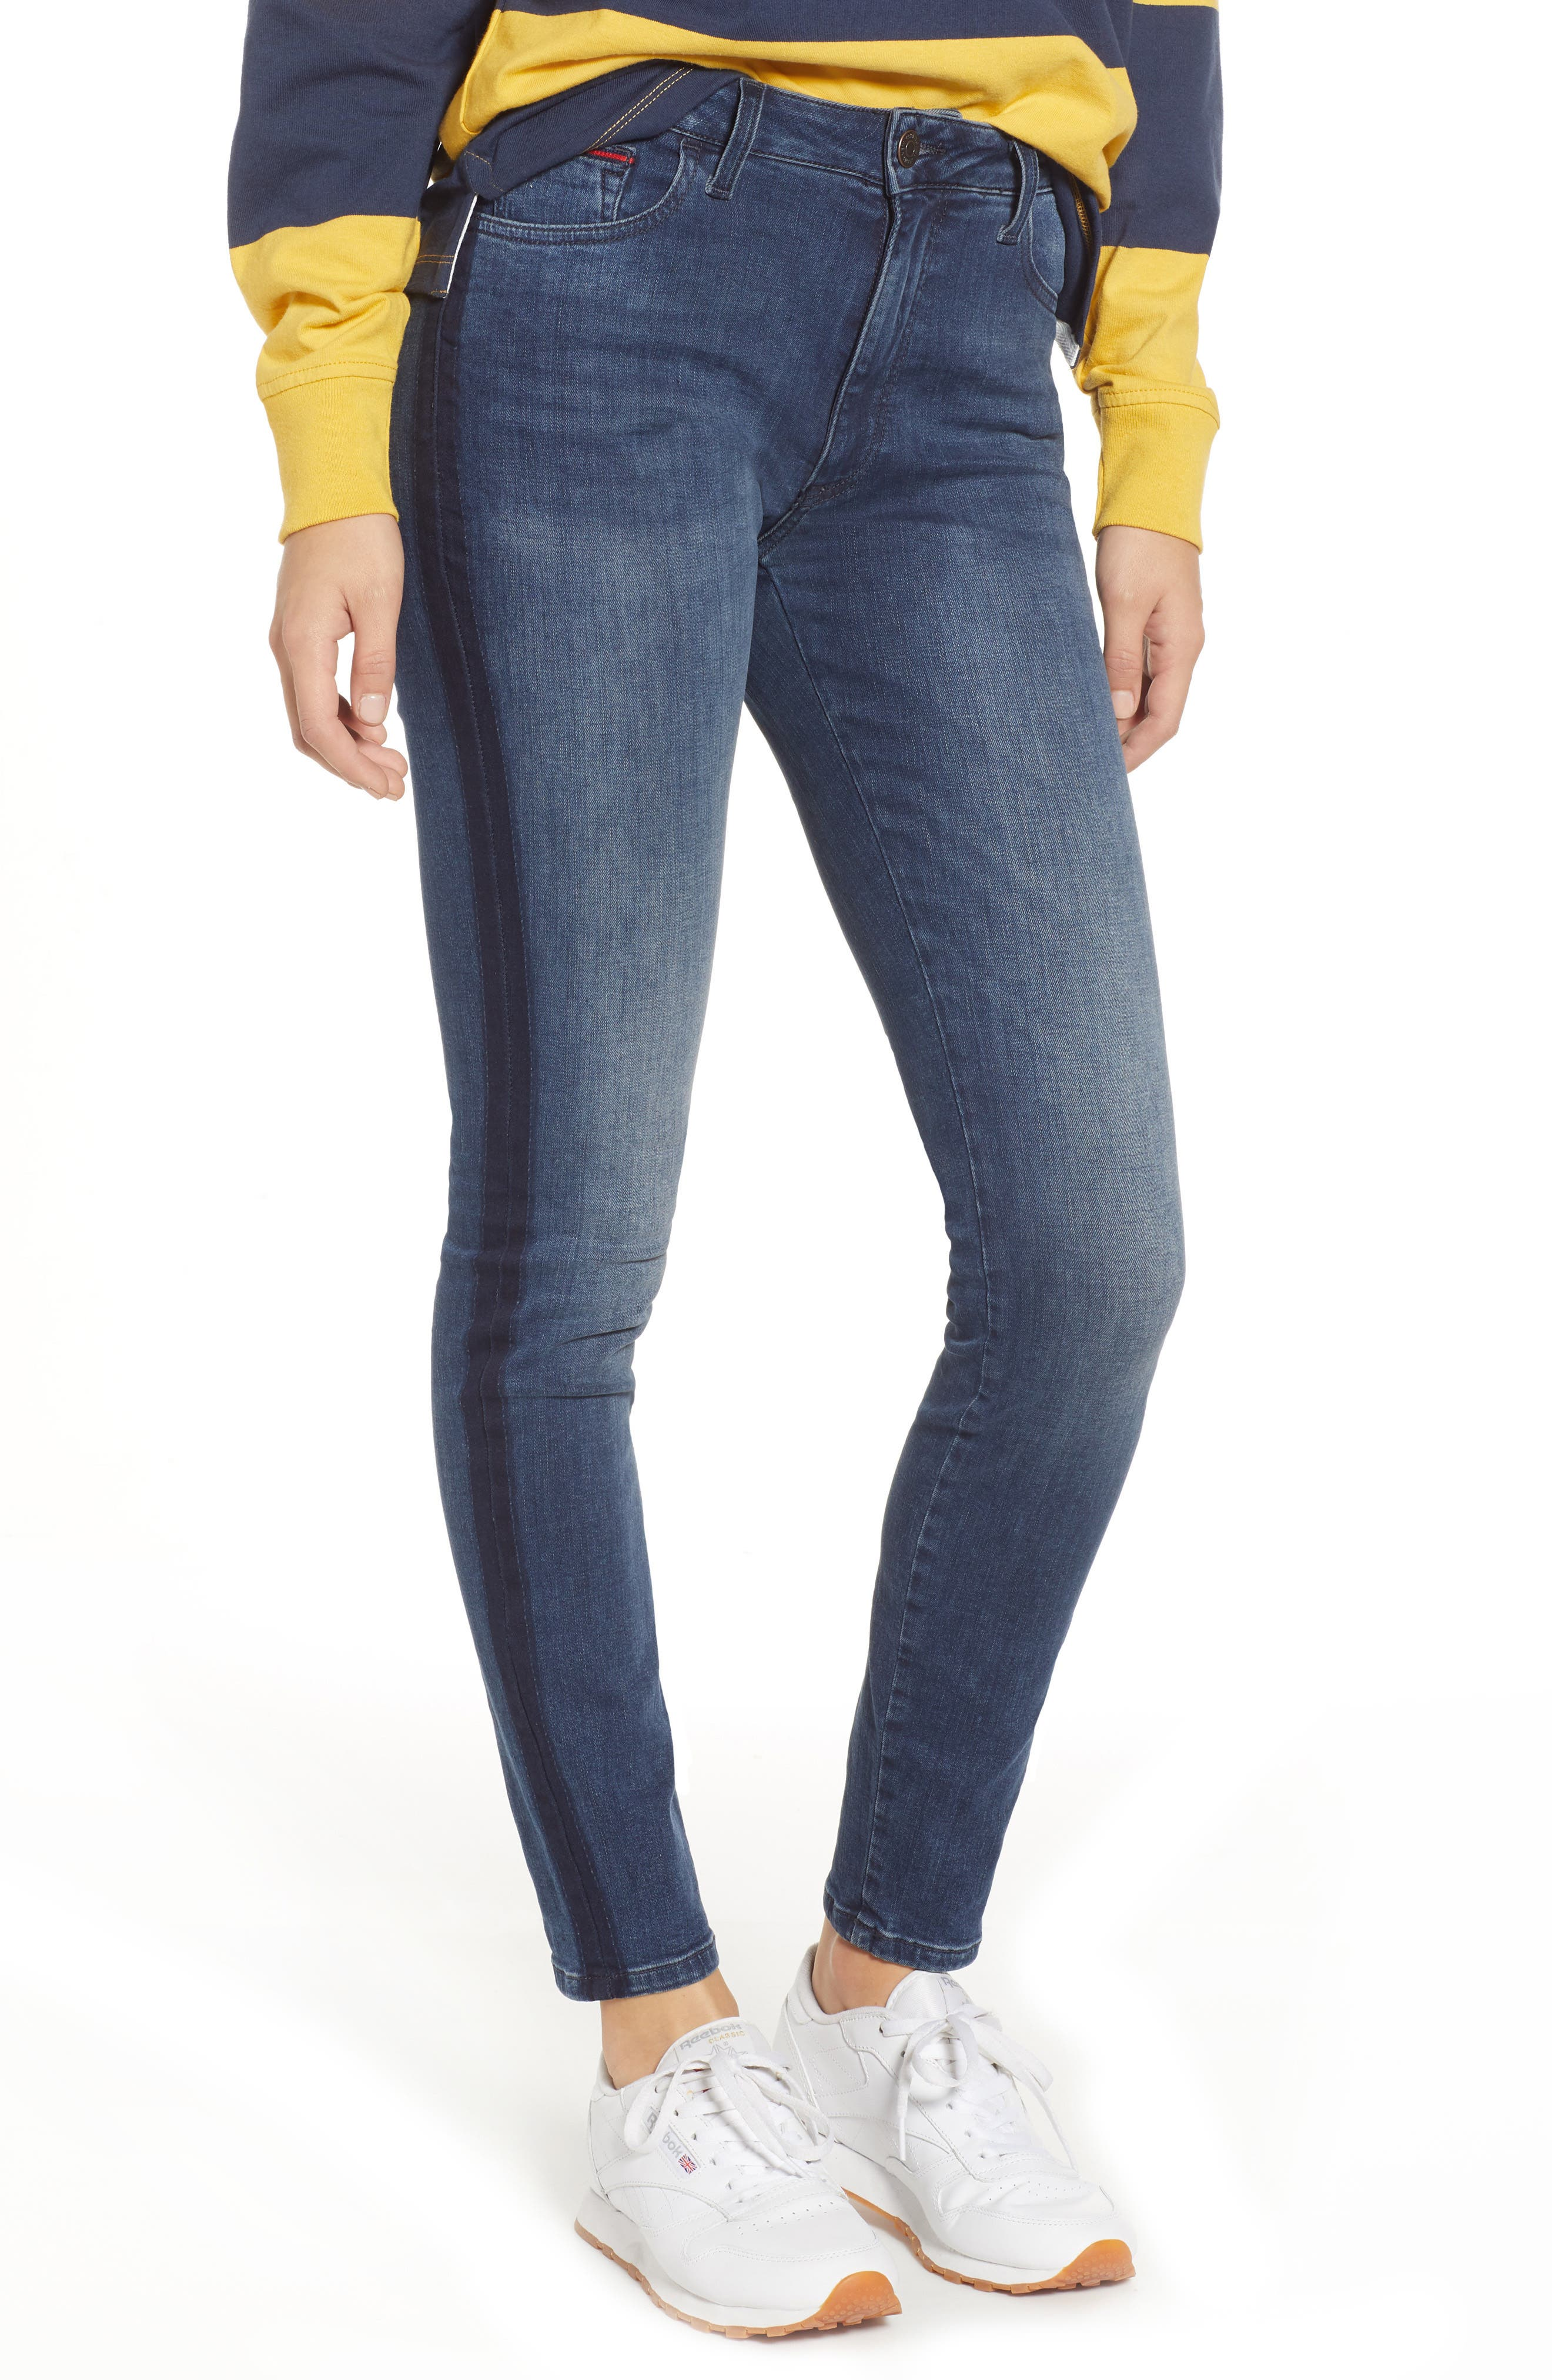 Santana High Waist Skinny Jeans,                         Main,                         color, NEDDLE DARK BLUE STRETCH